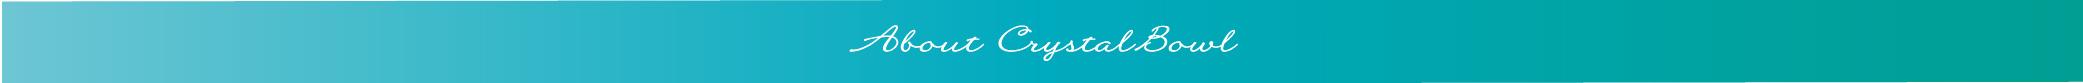 crystalnaia bowl title